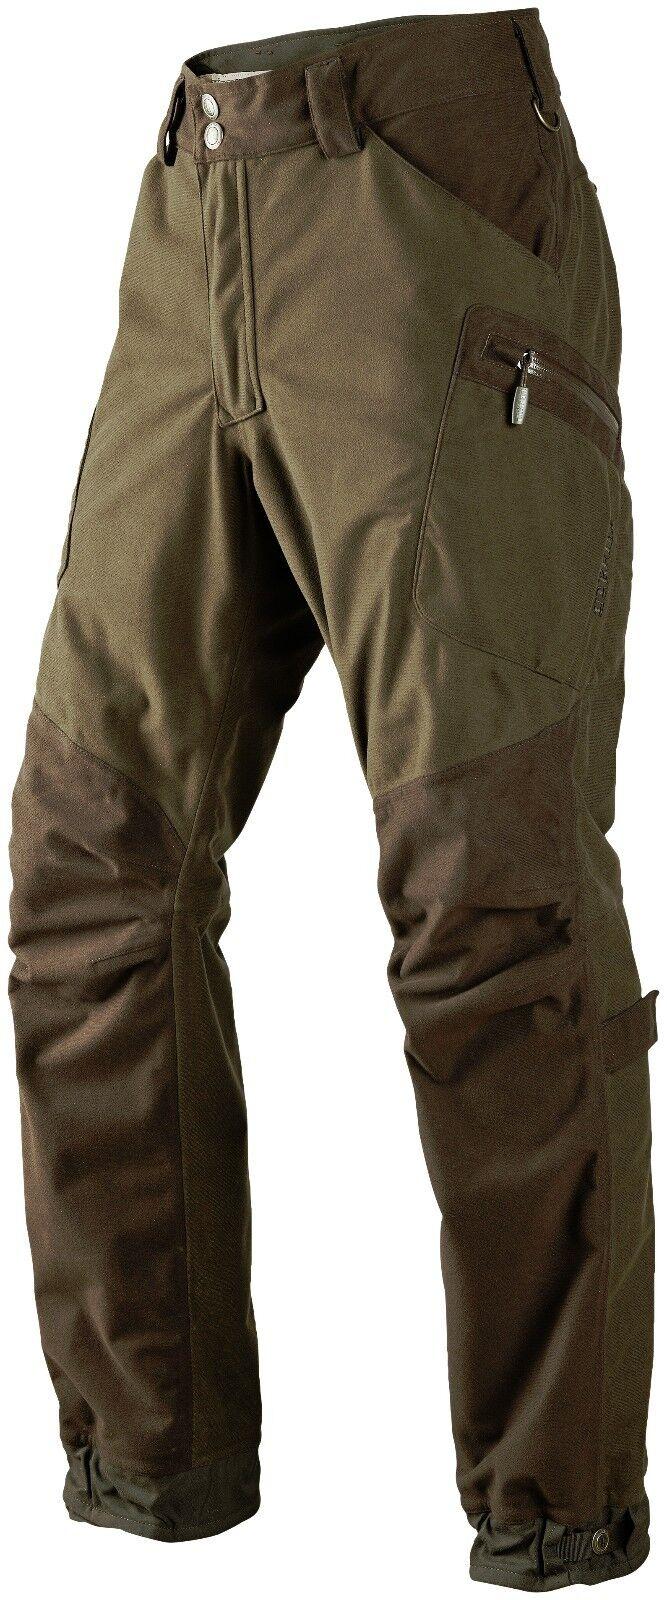 Harkila vector imperméable gore-tex tir pantalon